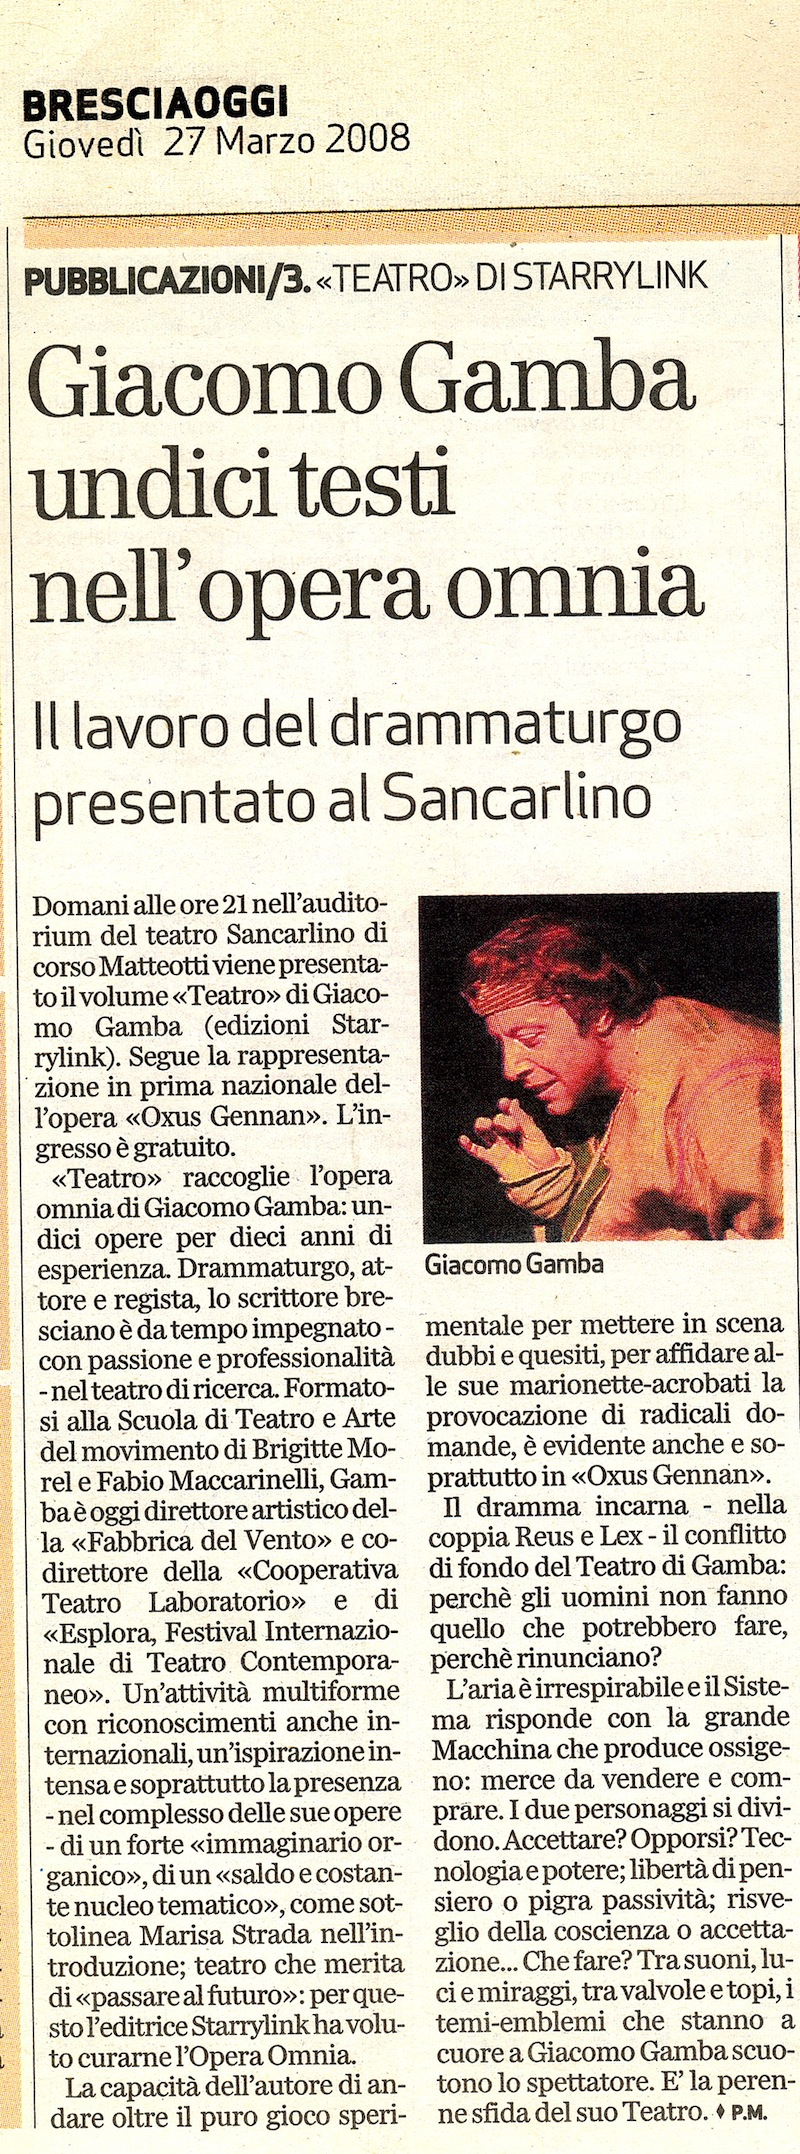 Opera omnia teatro di Giacomo Gamba